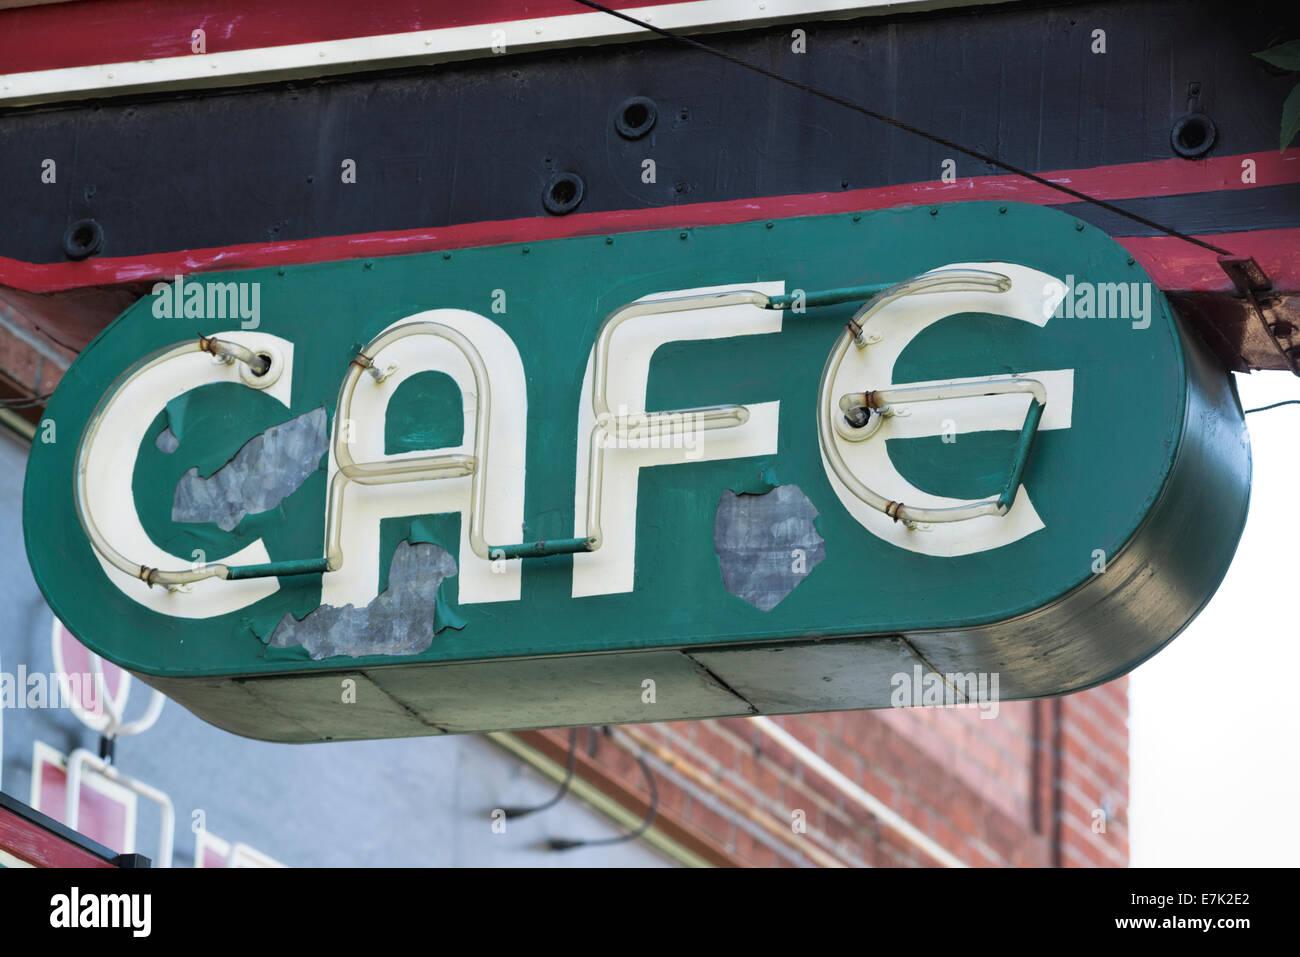 Unlit neon Cafe sign in downtown Walla Walla, Washington. - Stock Image